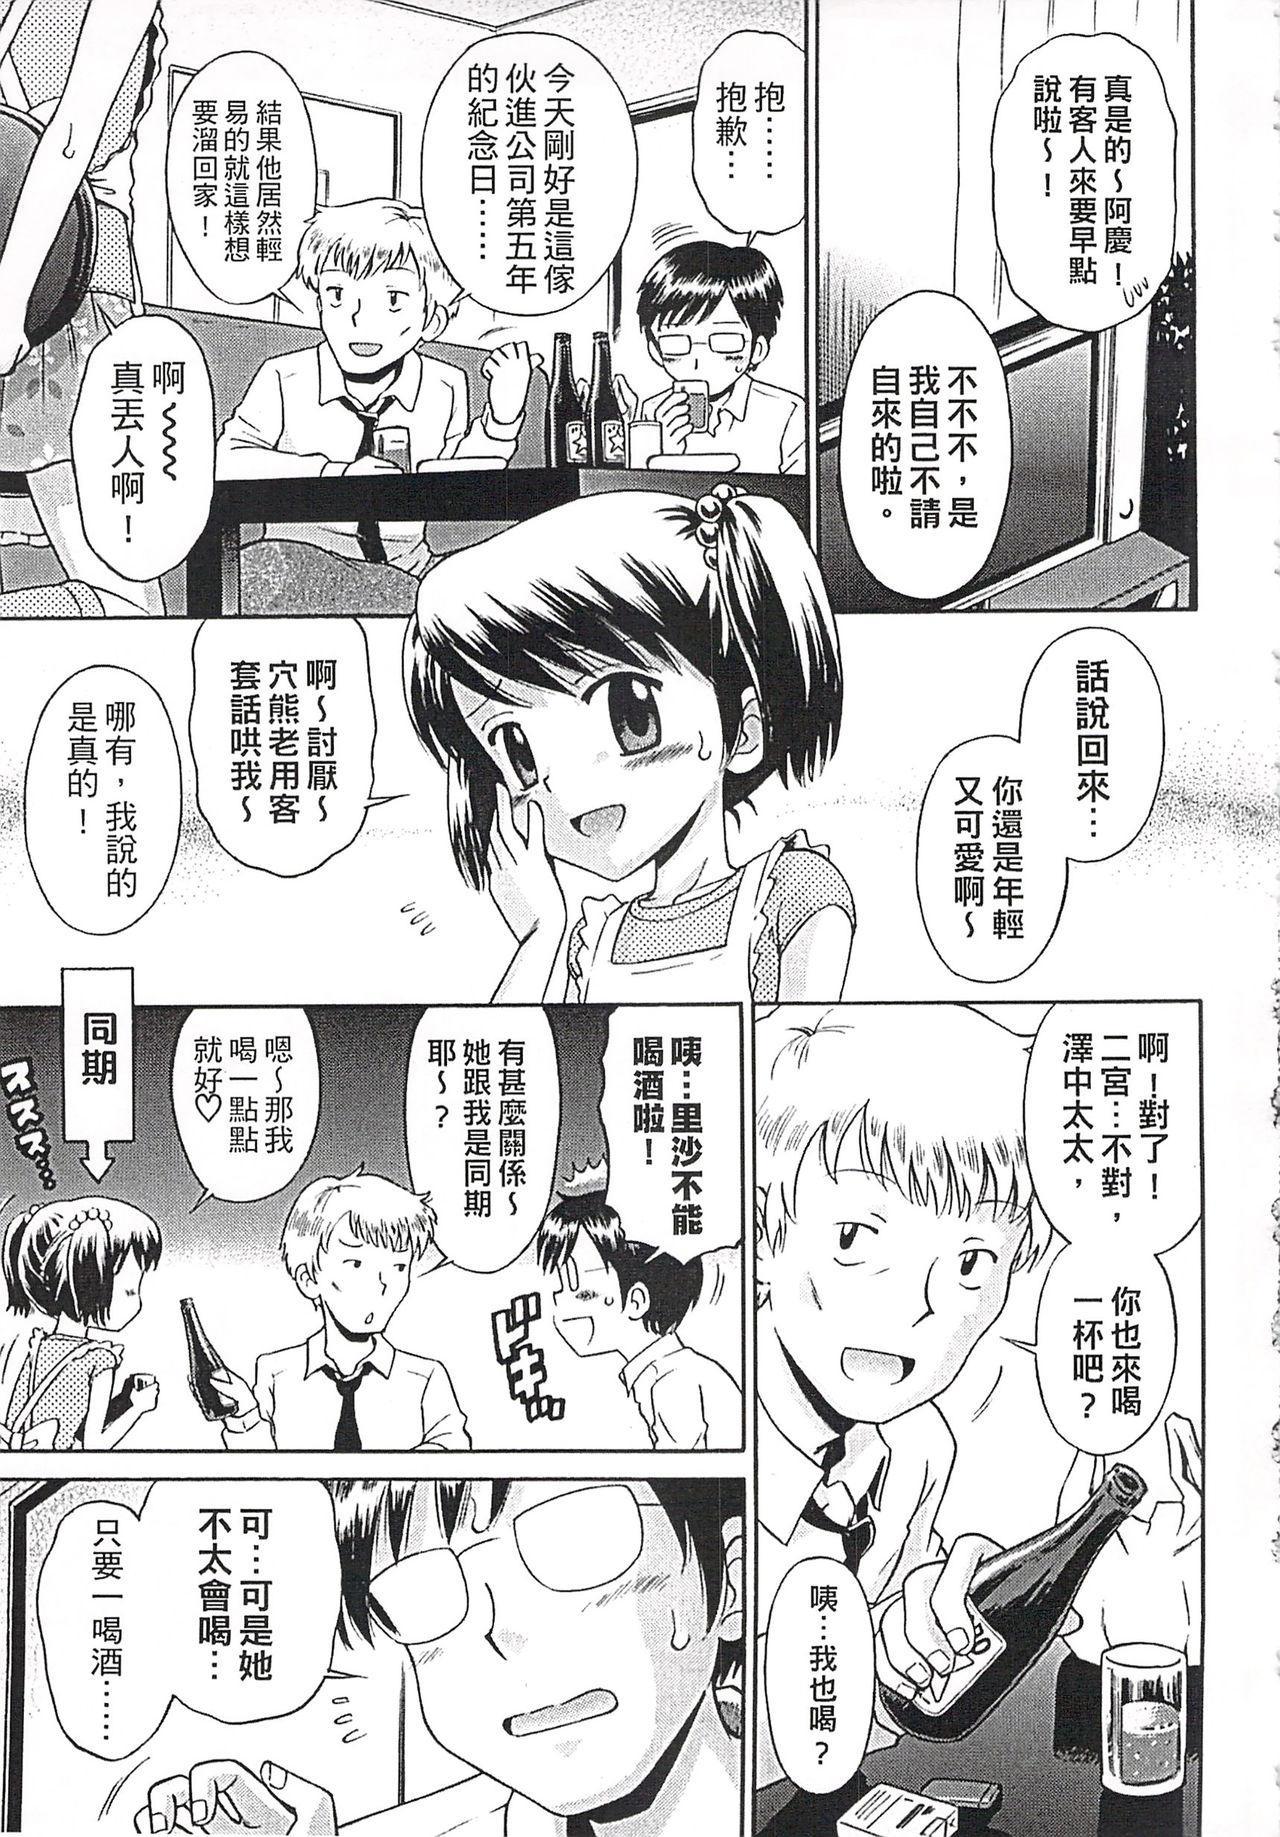 Kore demo Otona Desu Kedo!? Mrs.LOLITA Kanzenban   人家是大人啦! ~Mrs.LOLITA完全版 84